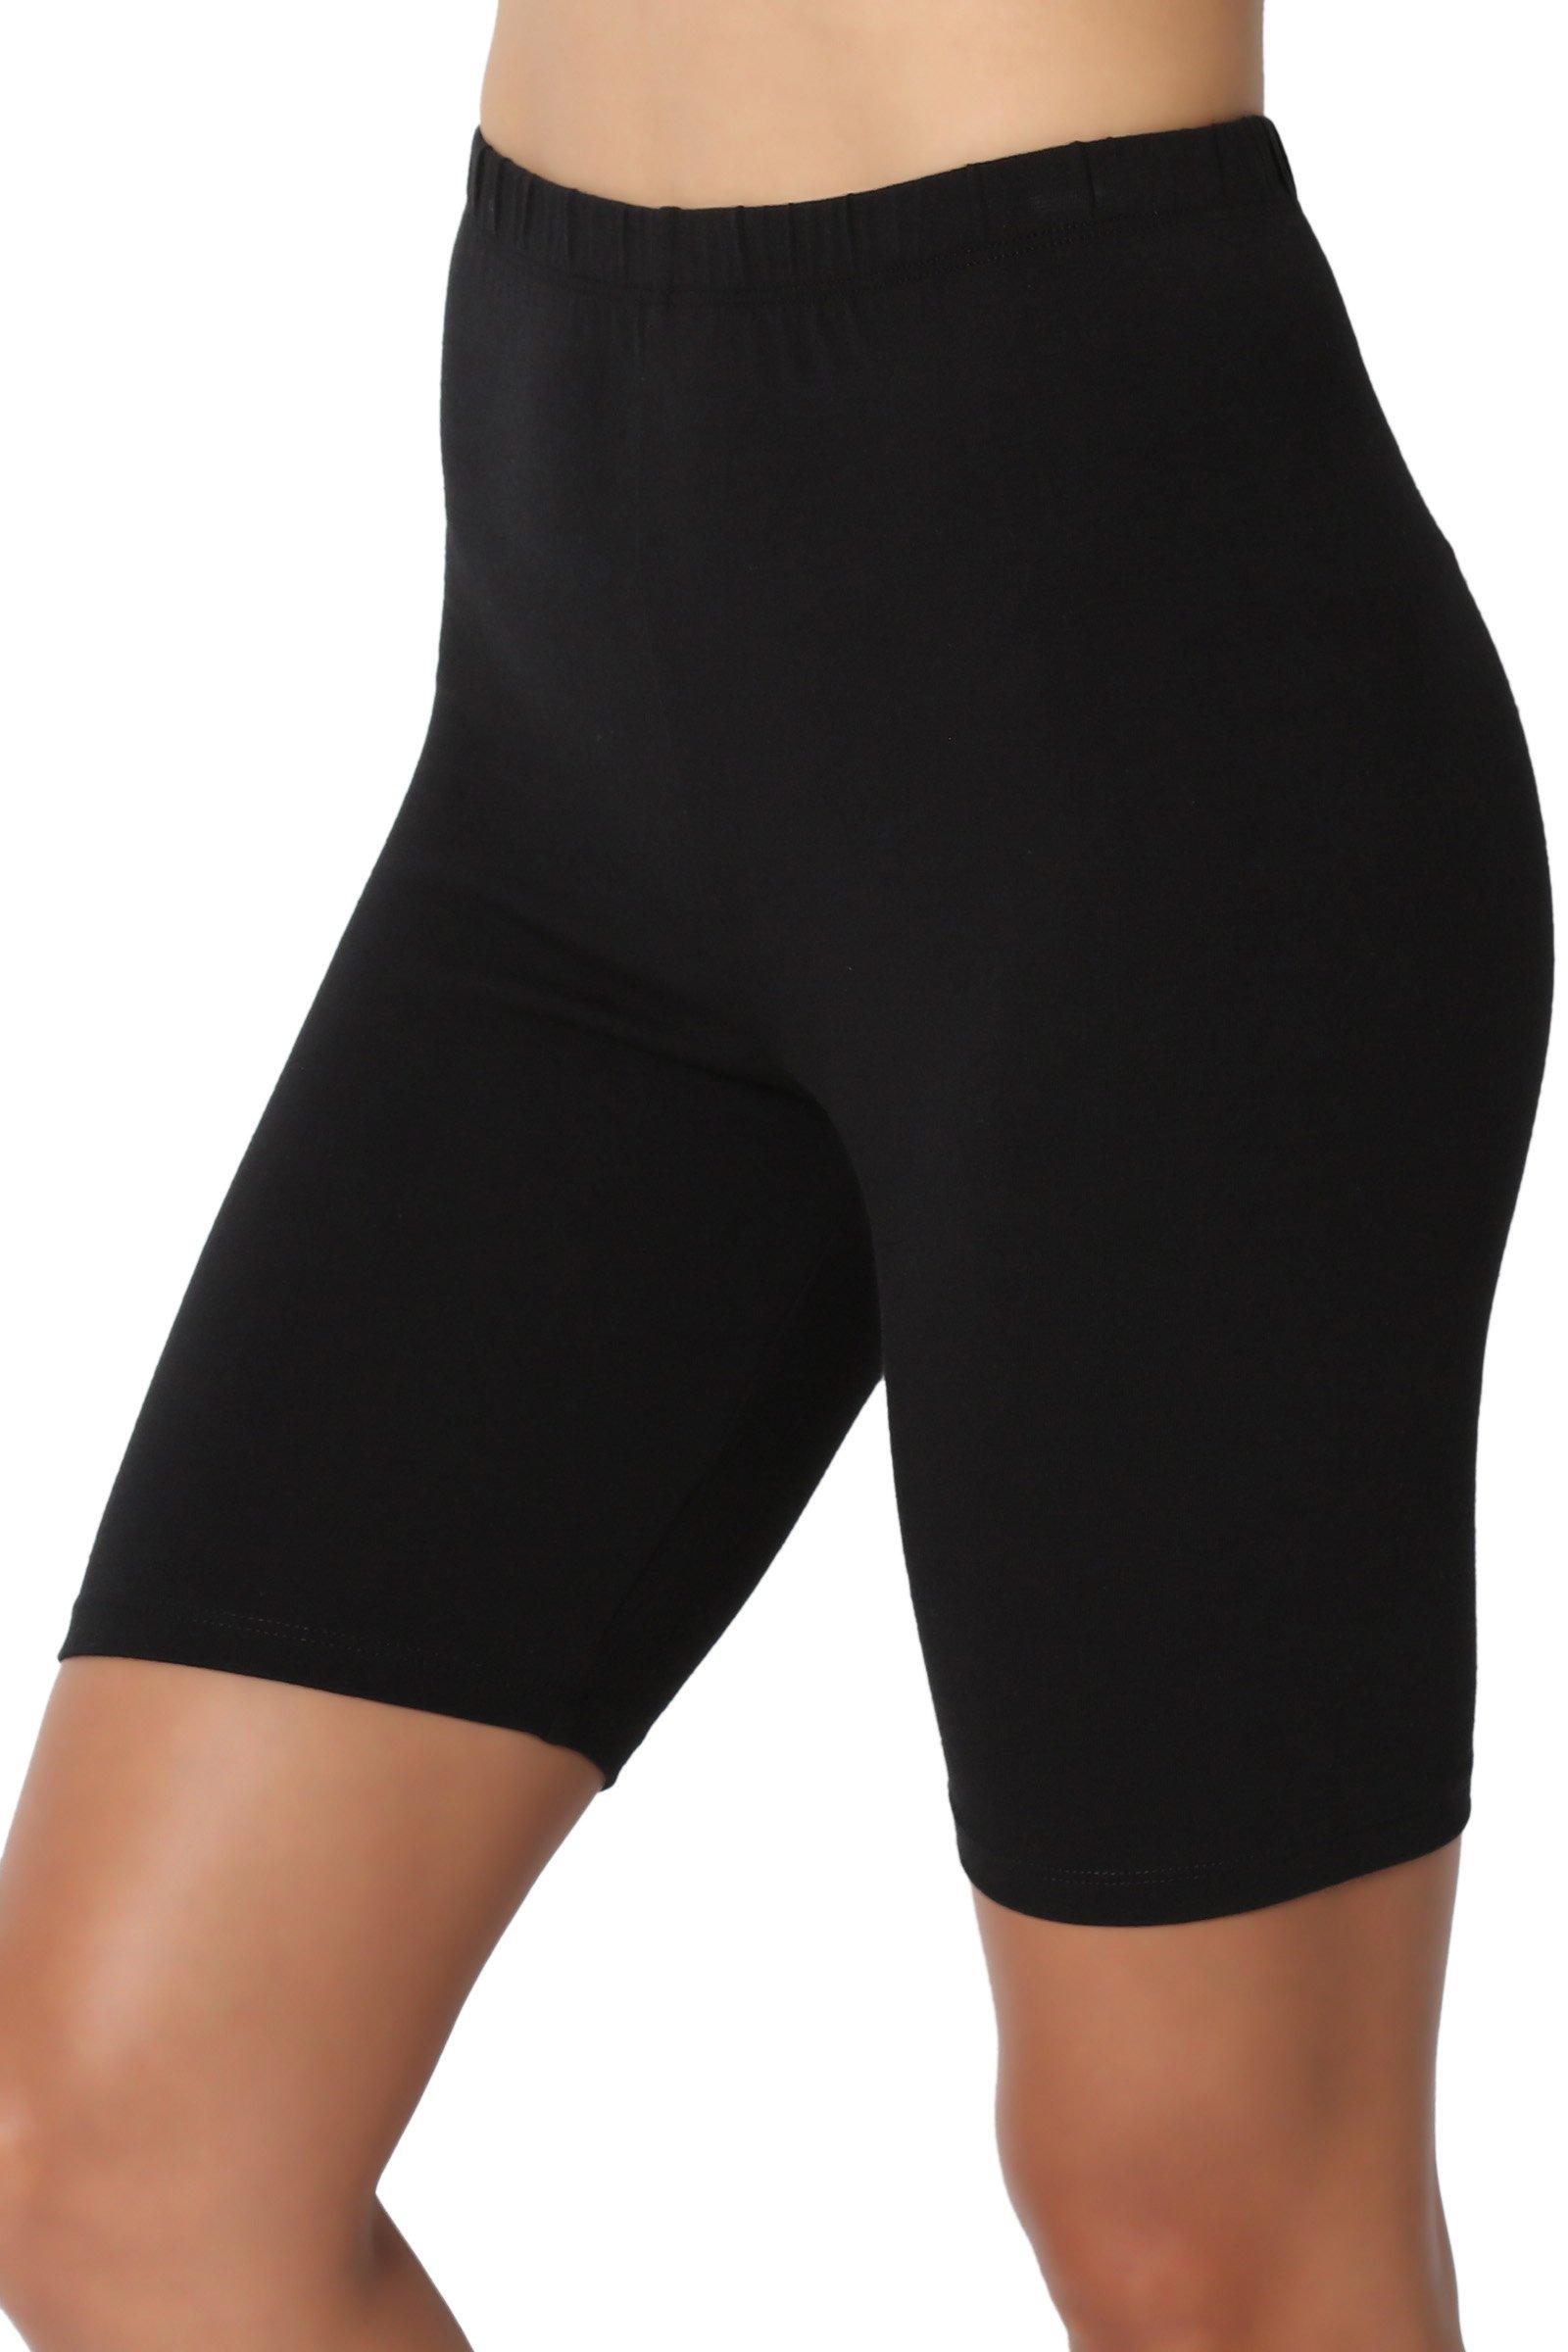 TheMogan Women's Mid Thigh Cotton High Waist Active Short Leggings Black M